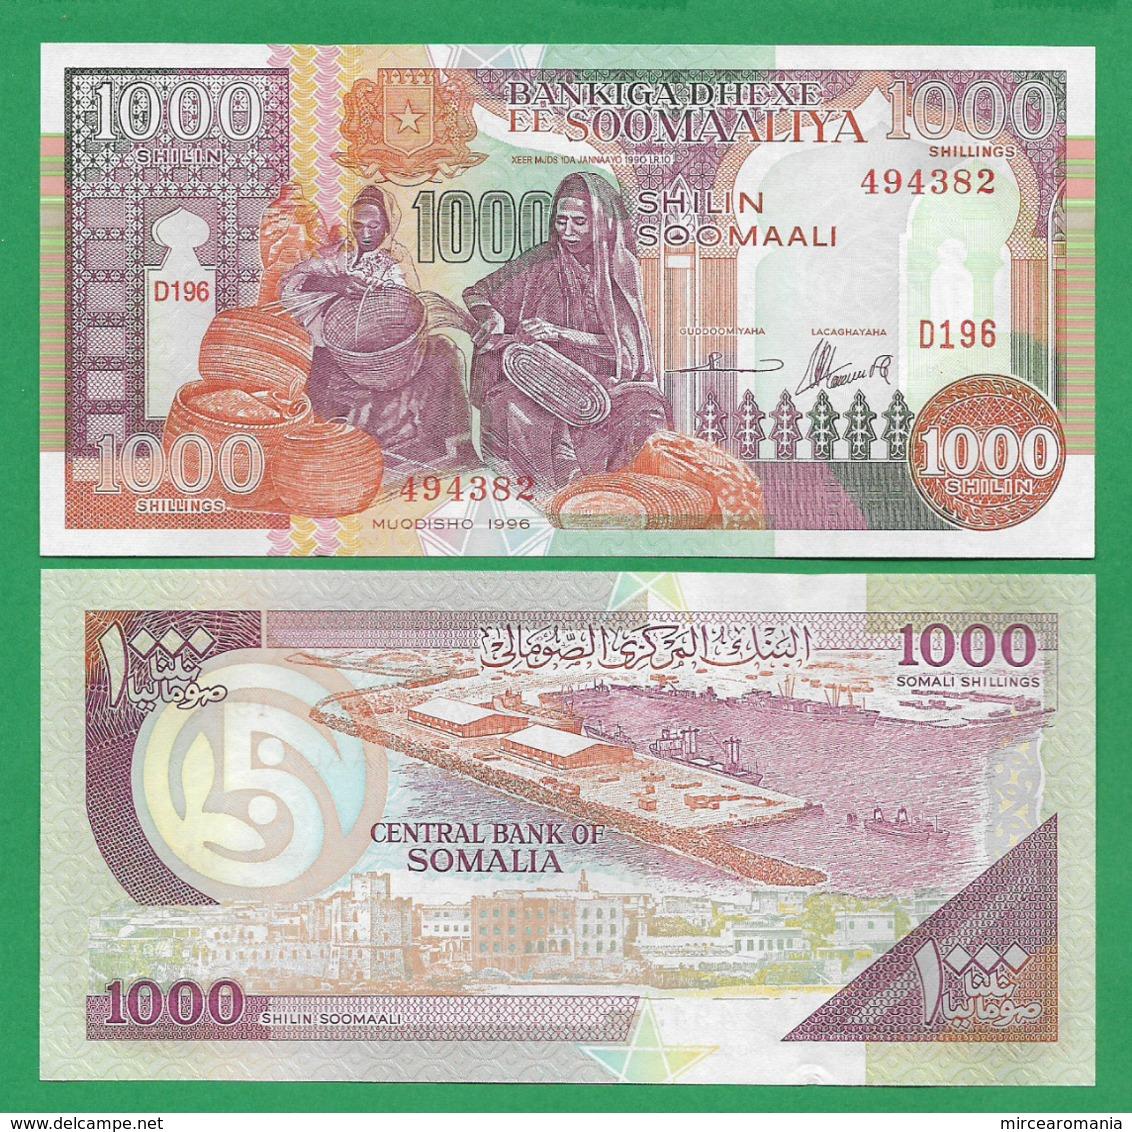 SOMALIA - 1000 SHILLINGS - 1996 - UNC - Somalia